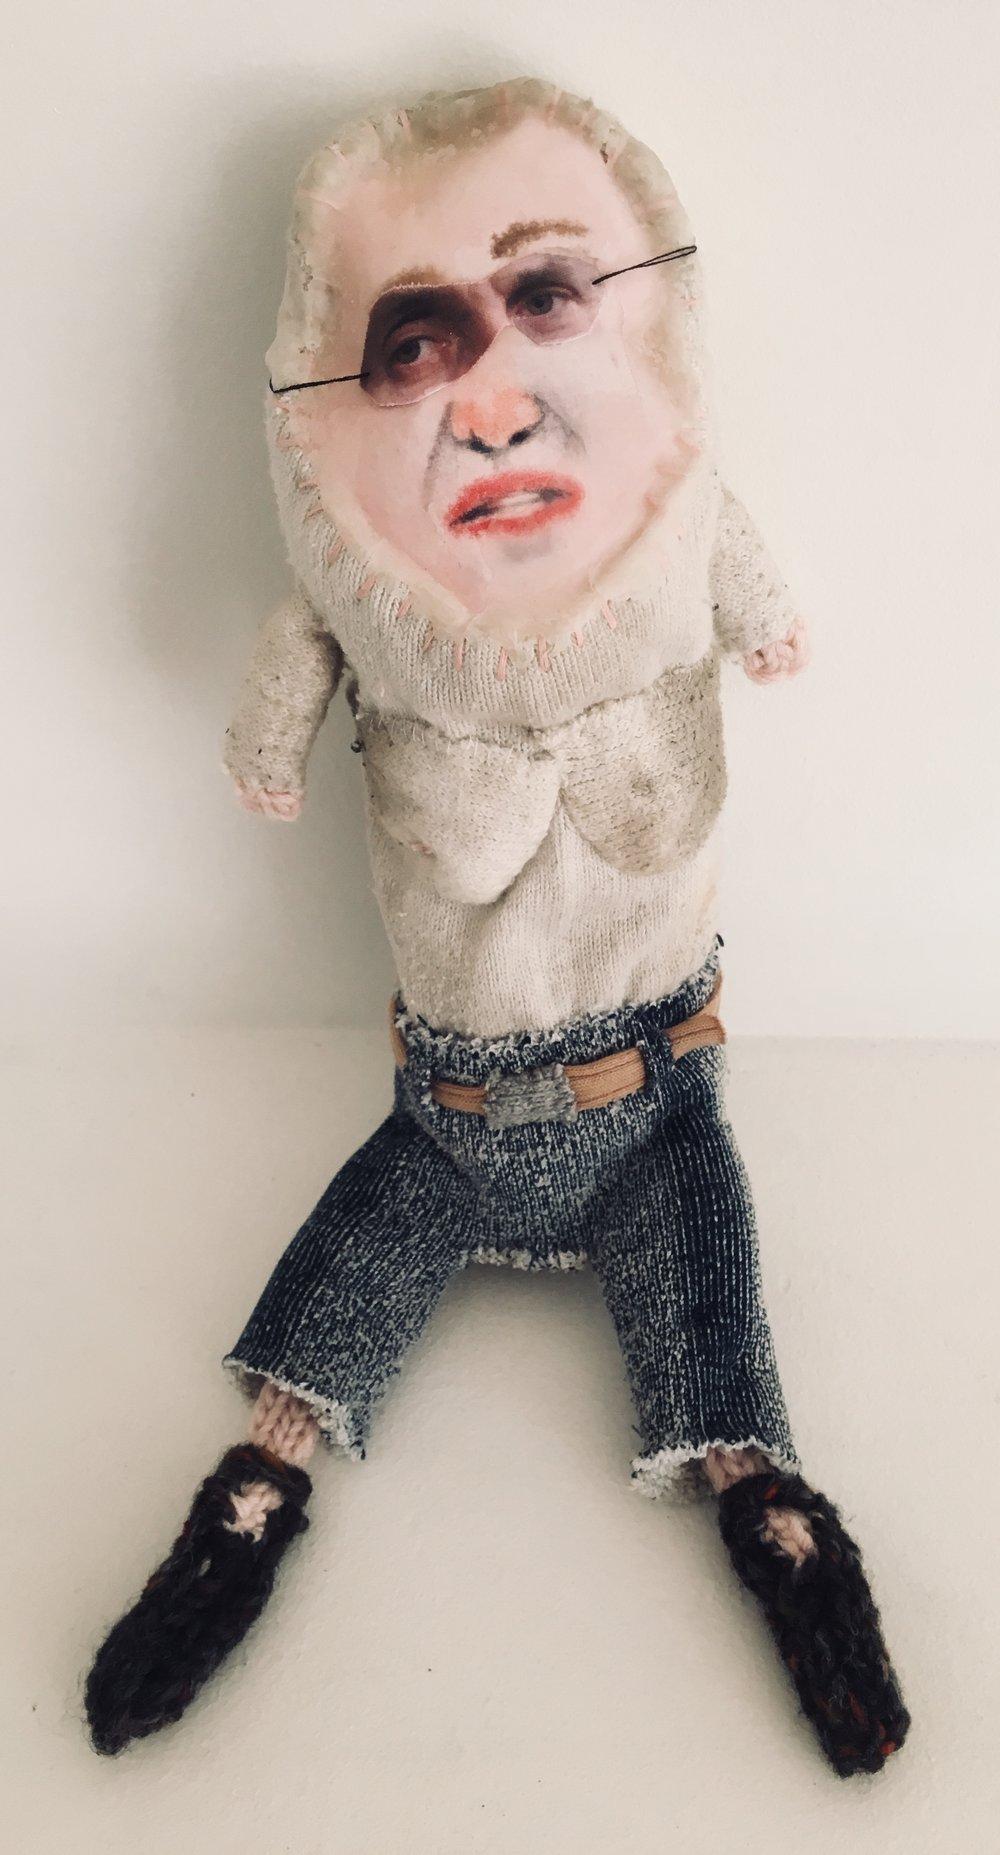 TGender Fluid doll series, Terry